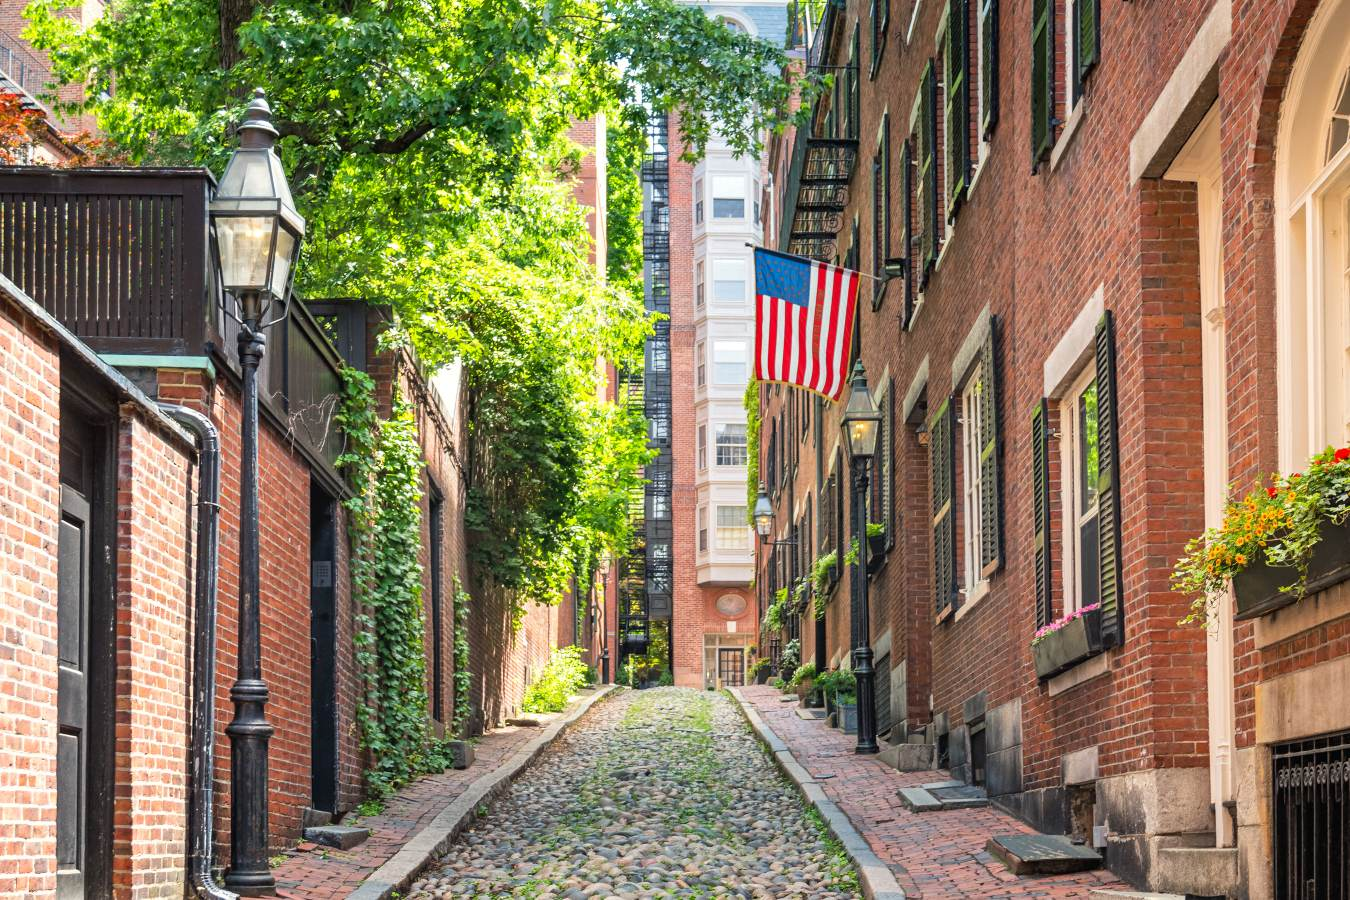 Bairro de Beacon Hill em Boston